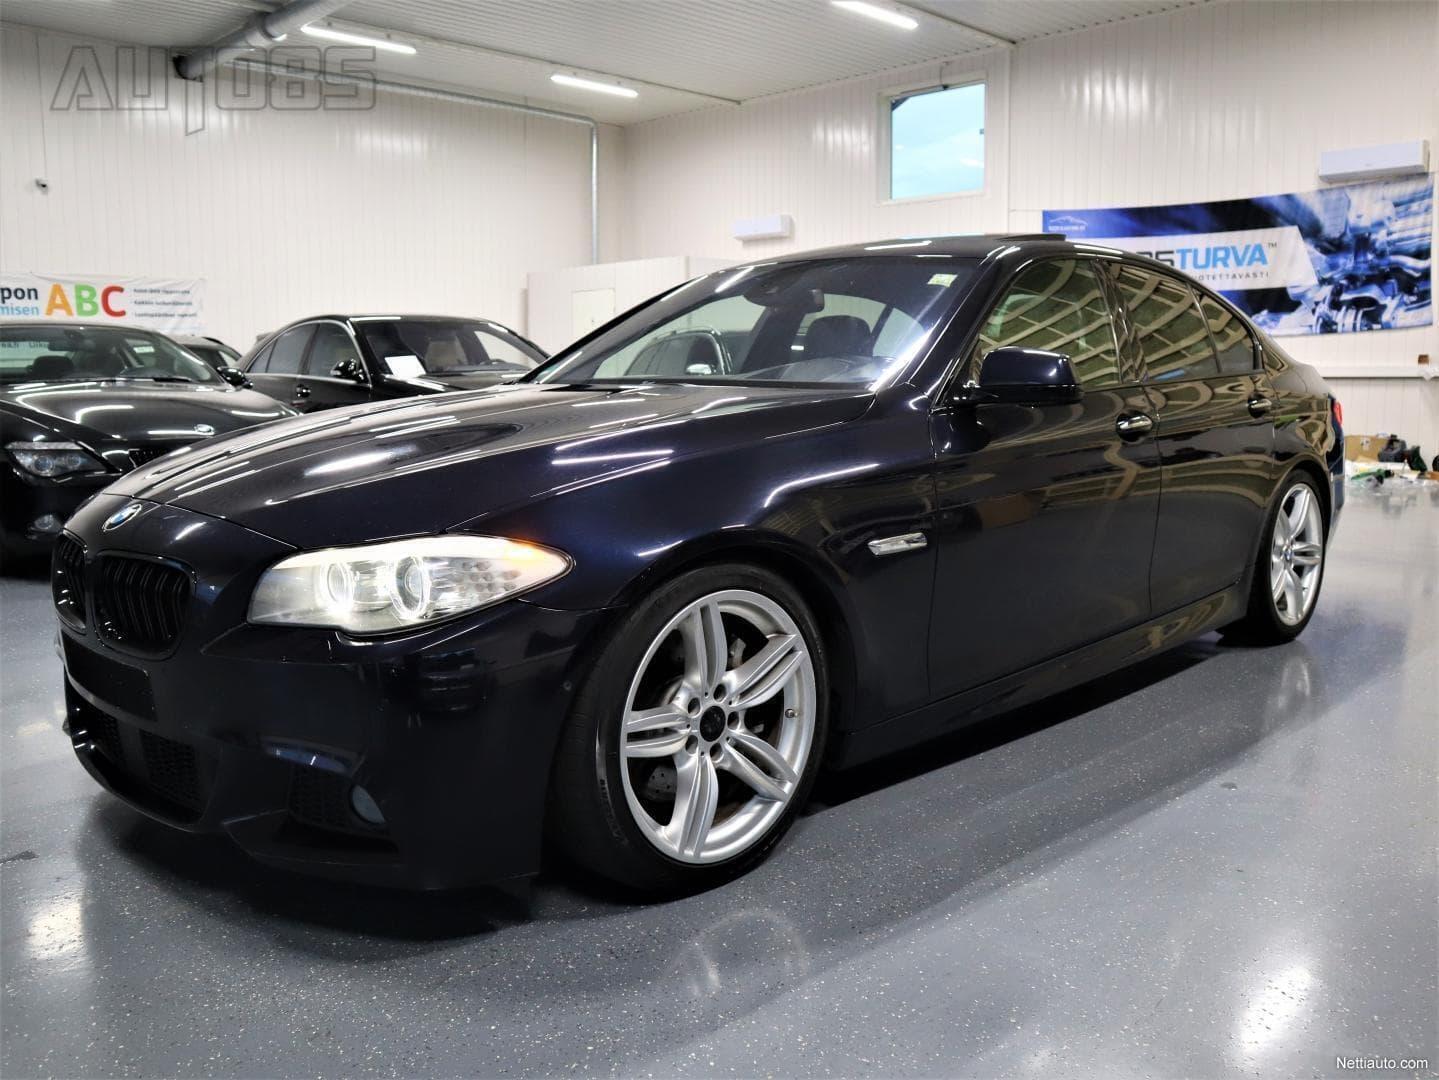 BMW 535 dA M-Sport xDrive * RAHOITUS 0e KÄSIRAHALLA * IMUOVET * HUD * ACC * MUISTIPENKIT * TUNNELMAVALAISTUS * HIFIT YMS